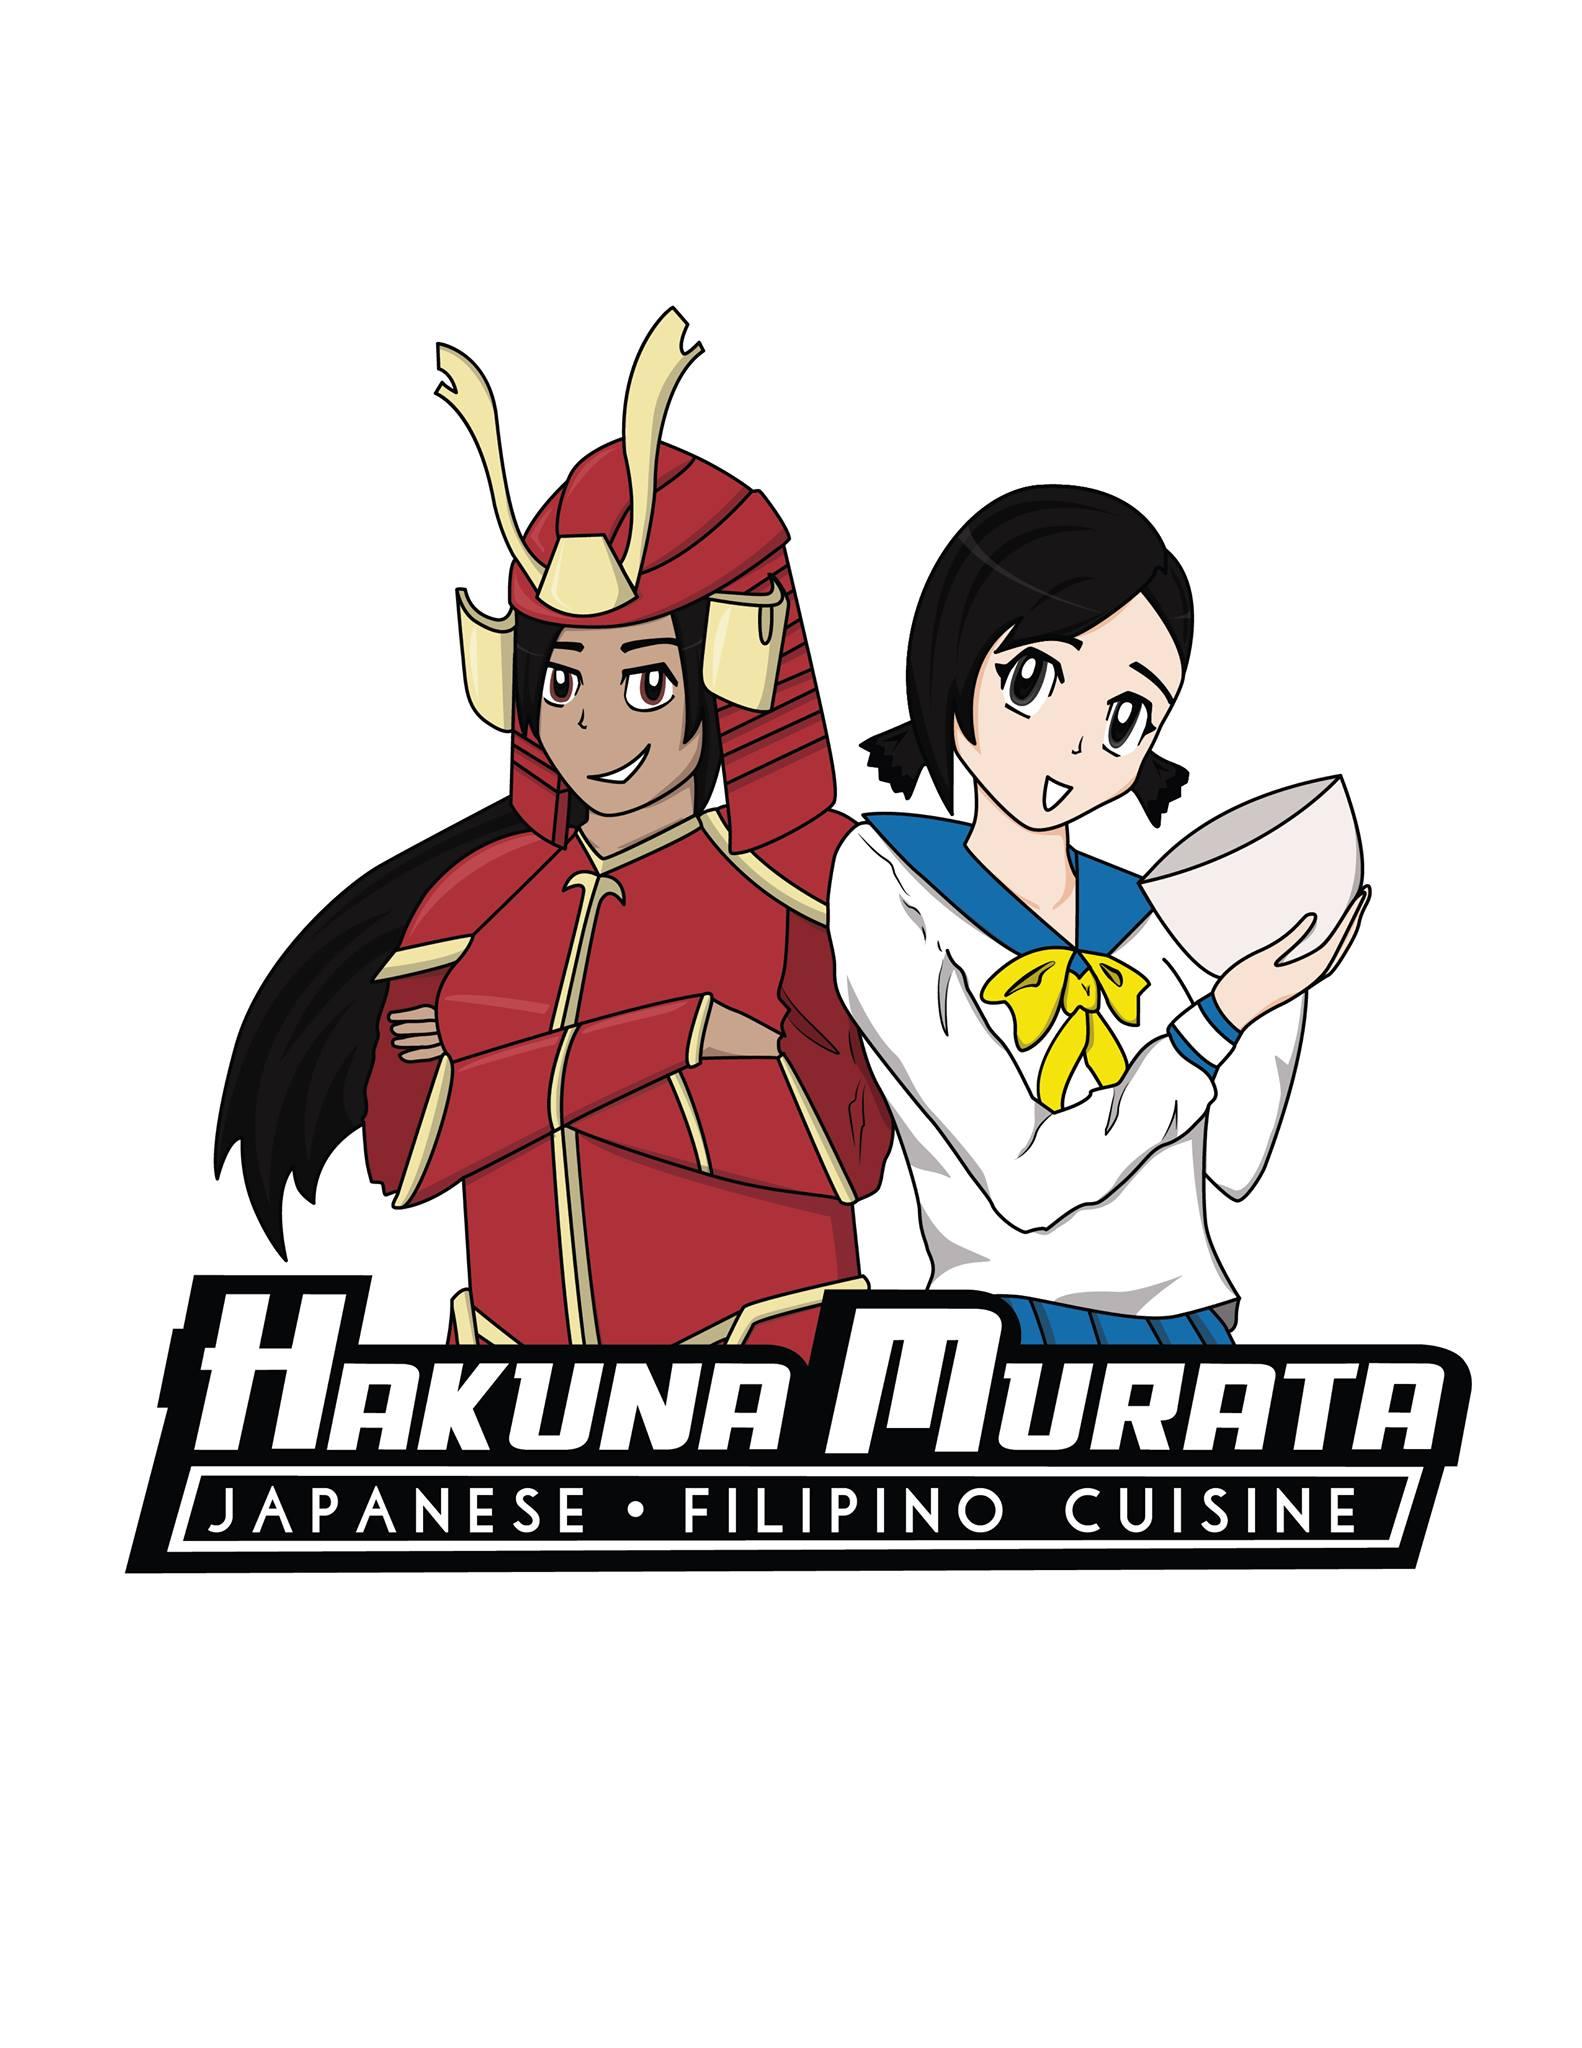 Hakuna Murata logo